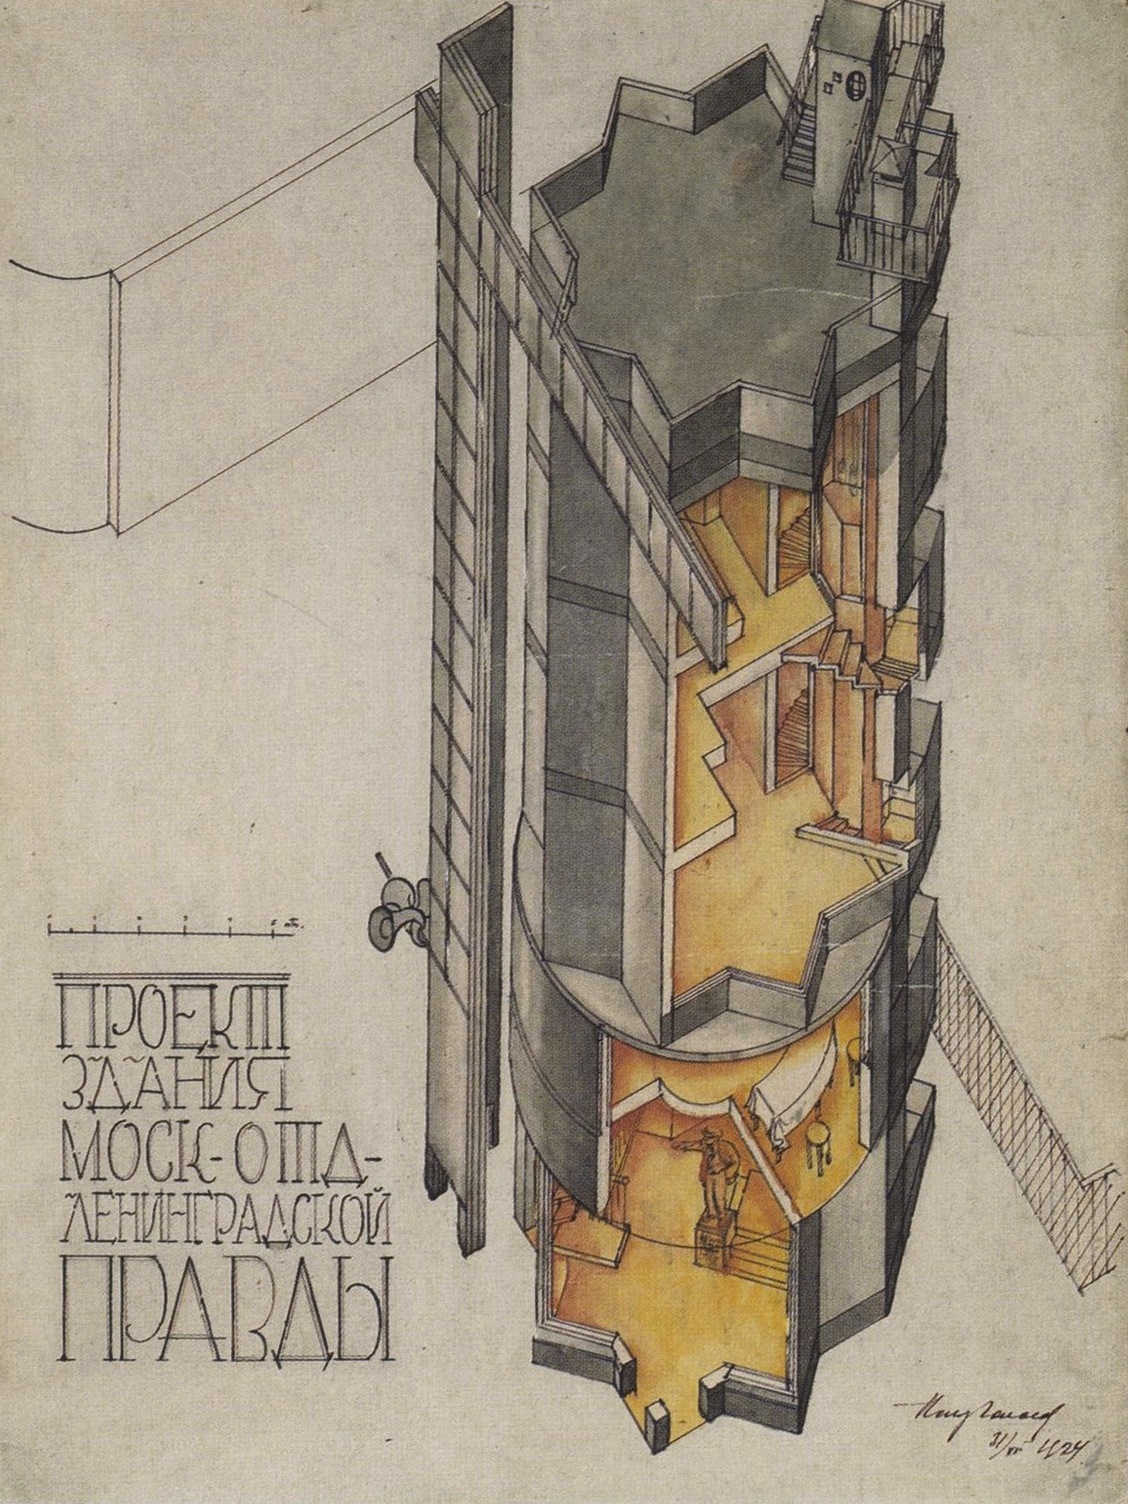 Il'ia Golosov, competition entry for the Leningrad Pravda (1924)